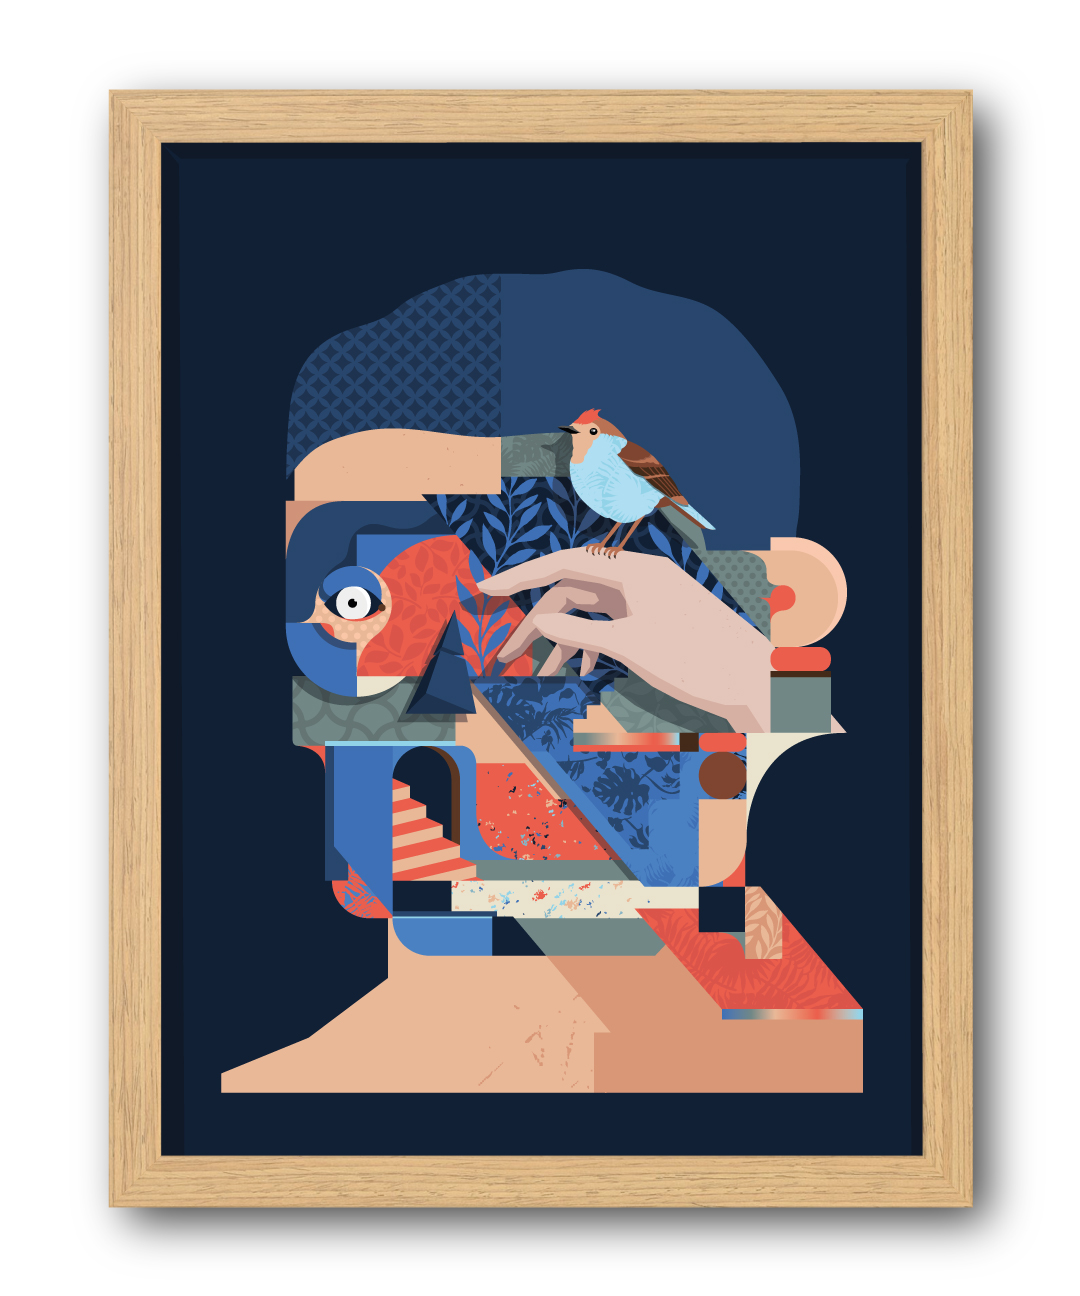 Niels-de-Jong-Title-Treasure-Framed